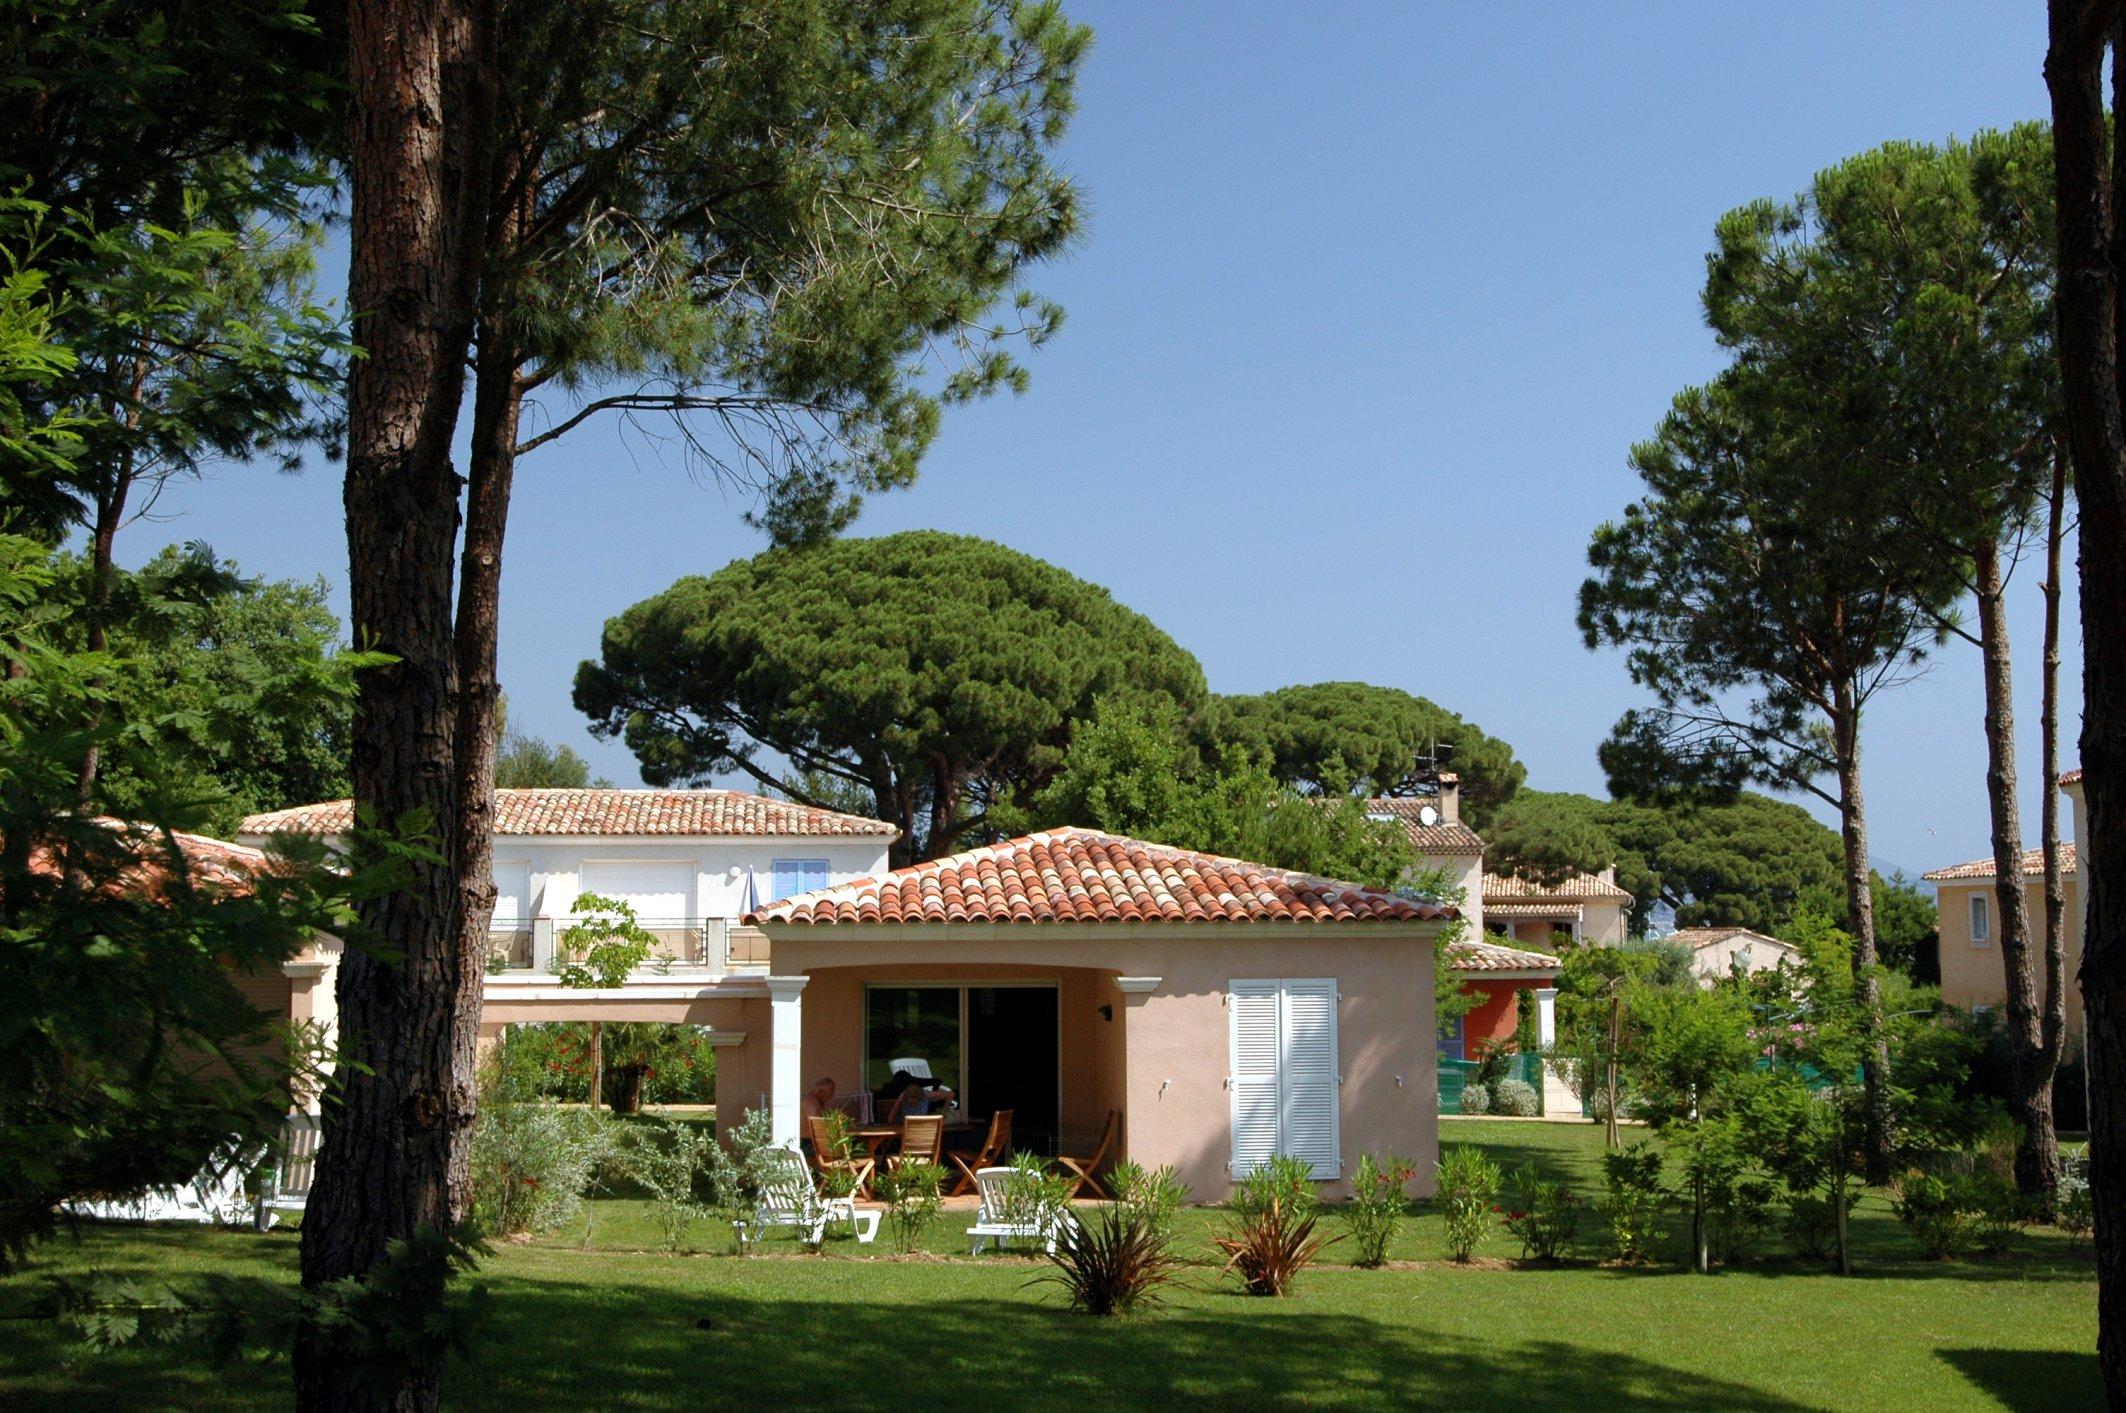 Odalys Gassin/St. Tropez Villa 3p6 Le Clos